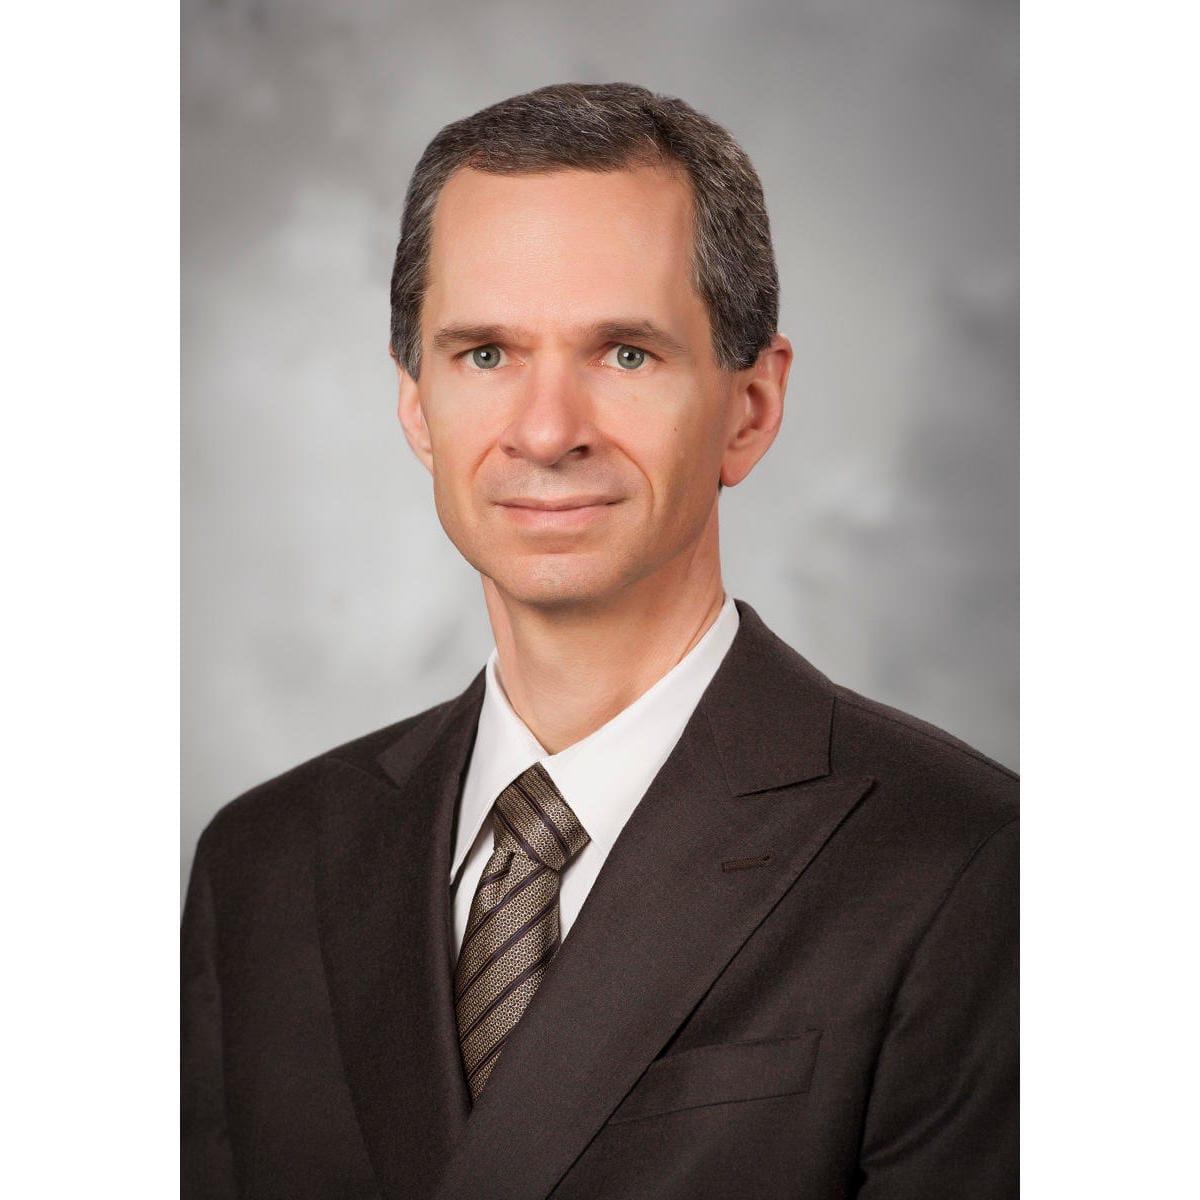 Credentials Dr Andrew Pruitt Md Ypsilanti Mi